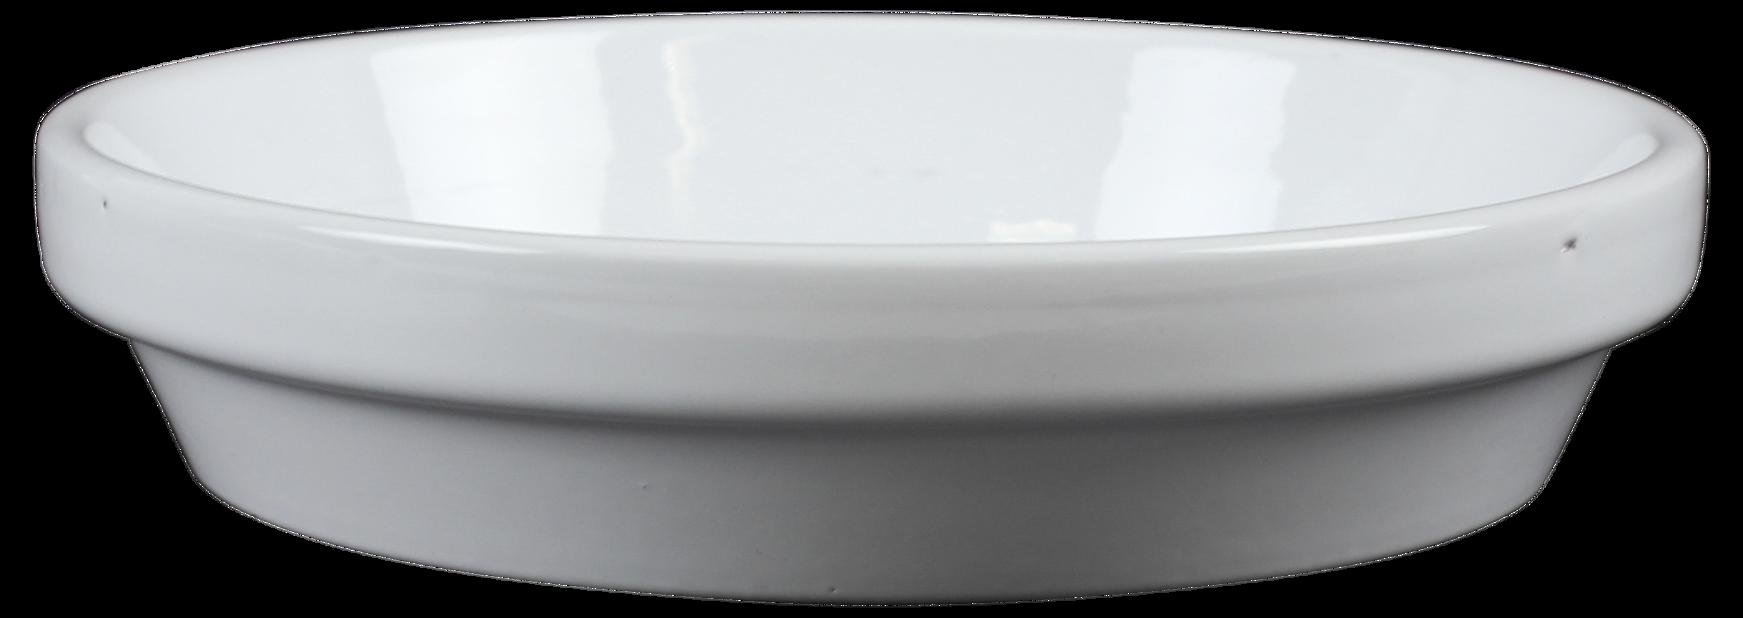 Fat terracotta ø15cm, hvit